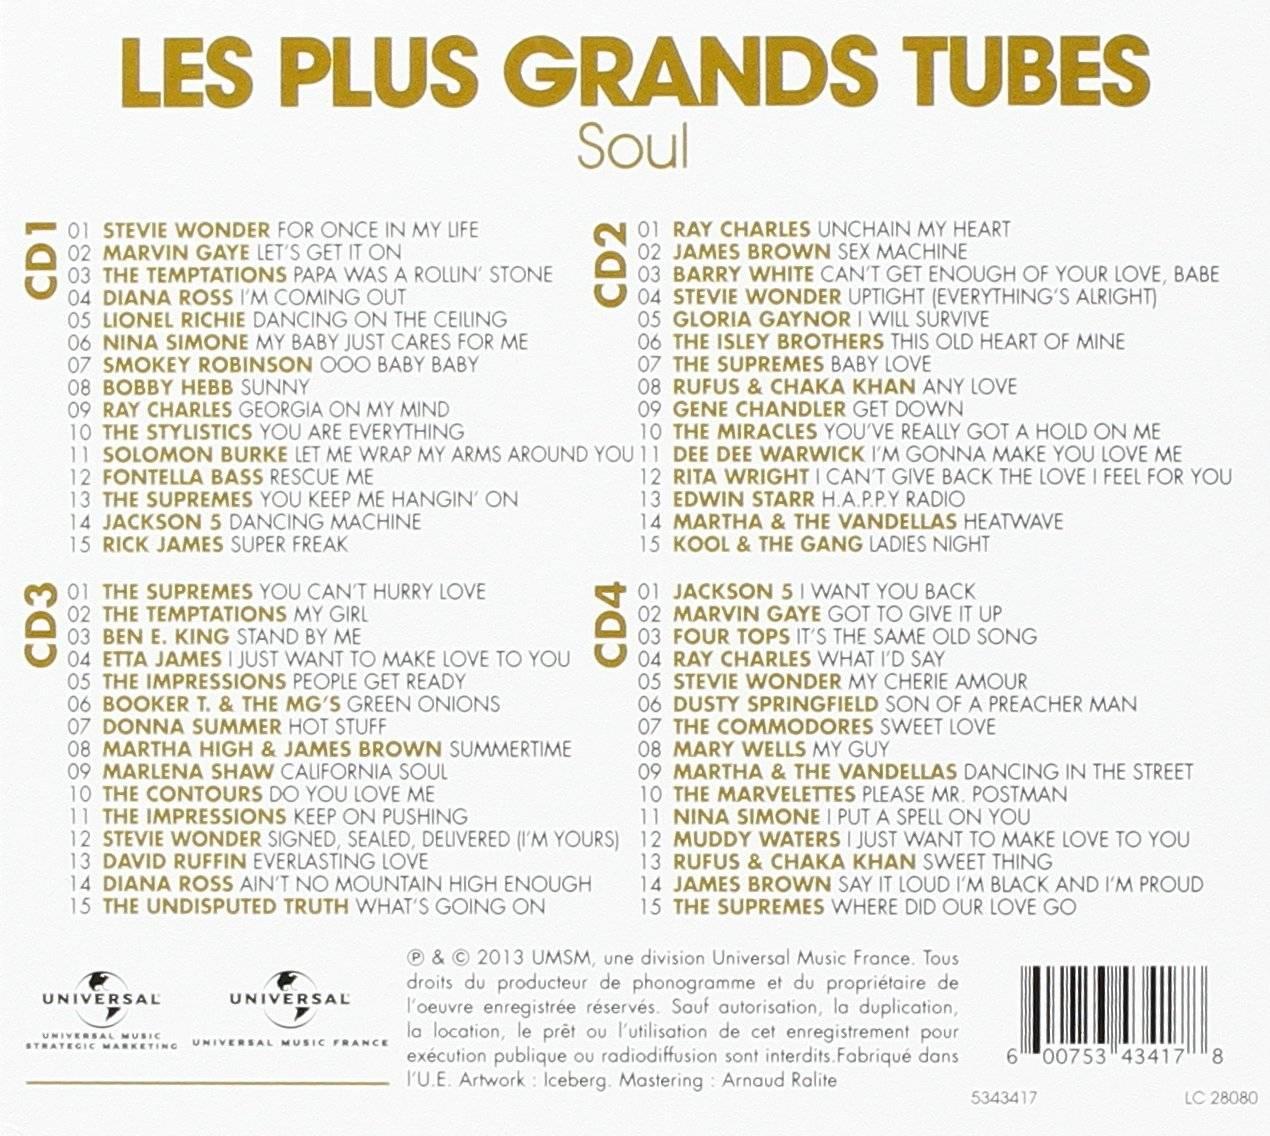 V.A. - Les Plus Grands Tubes Soul (4CD Box Set, 2013)